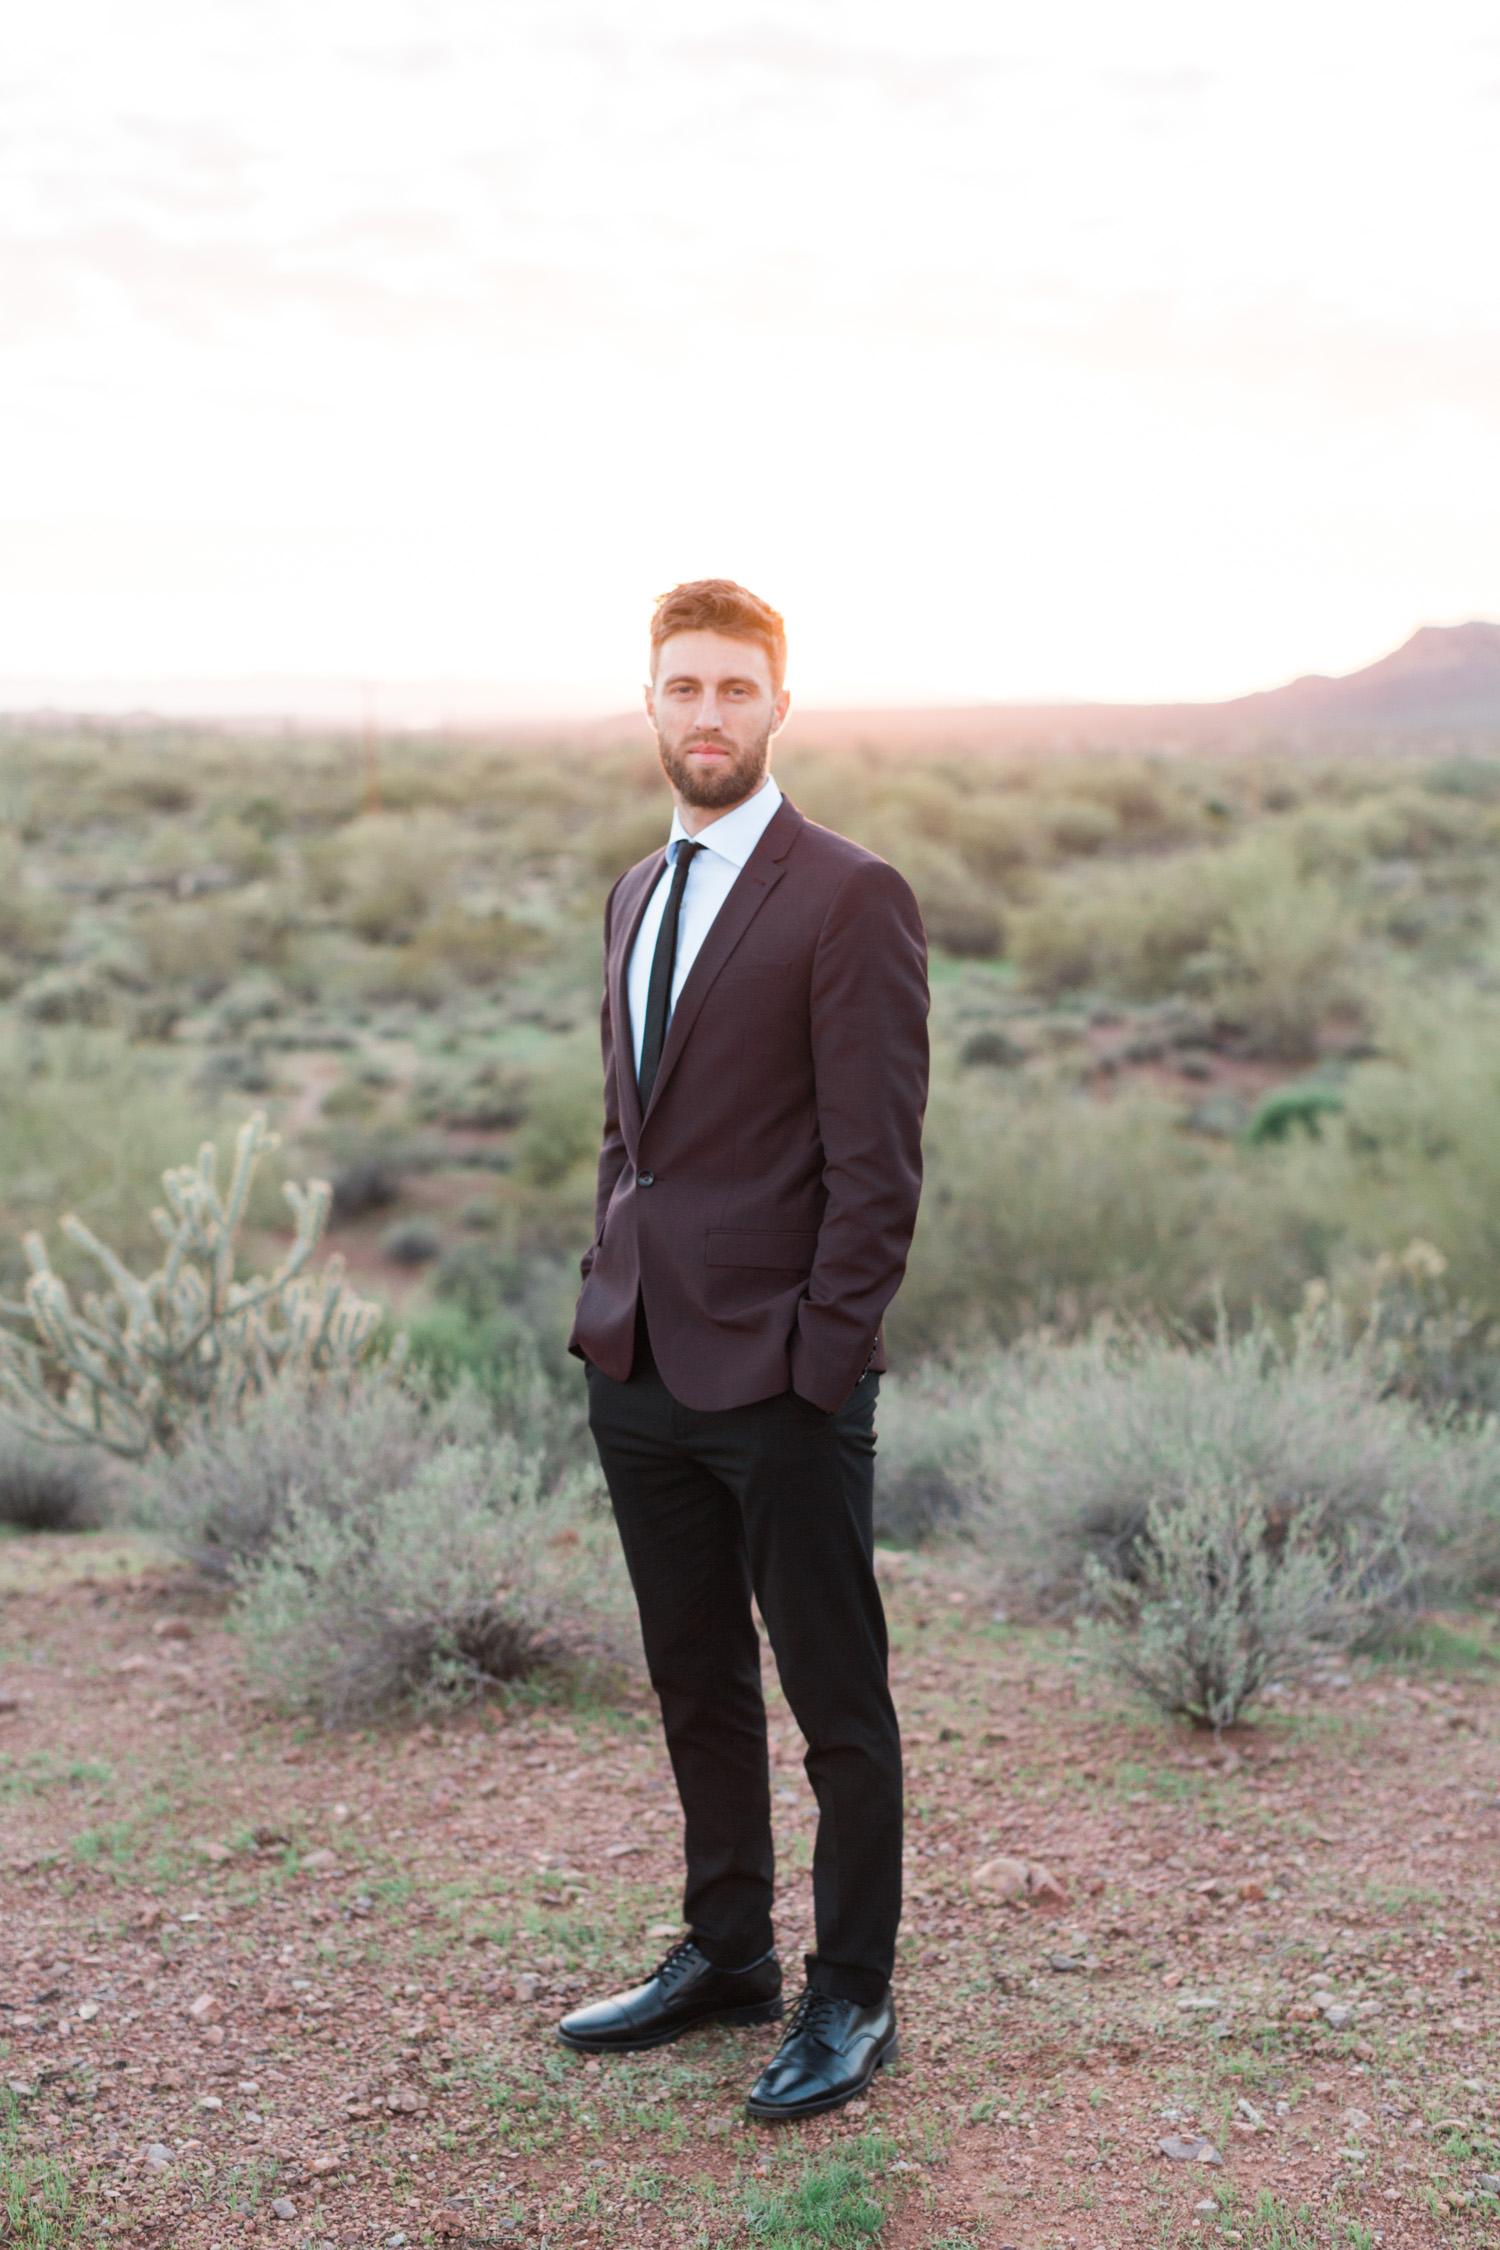 Hip groom in the desert on his wedding day in Phoenix, AZ.